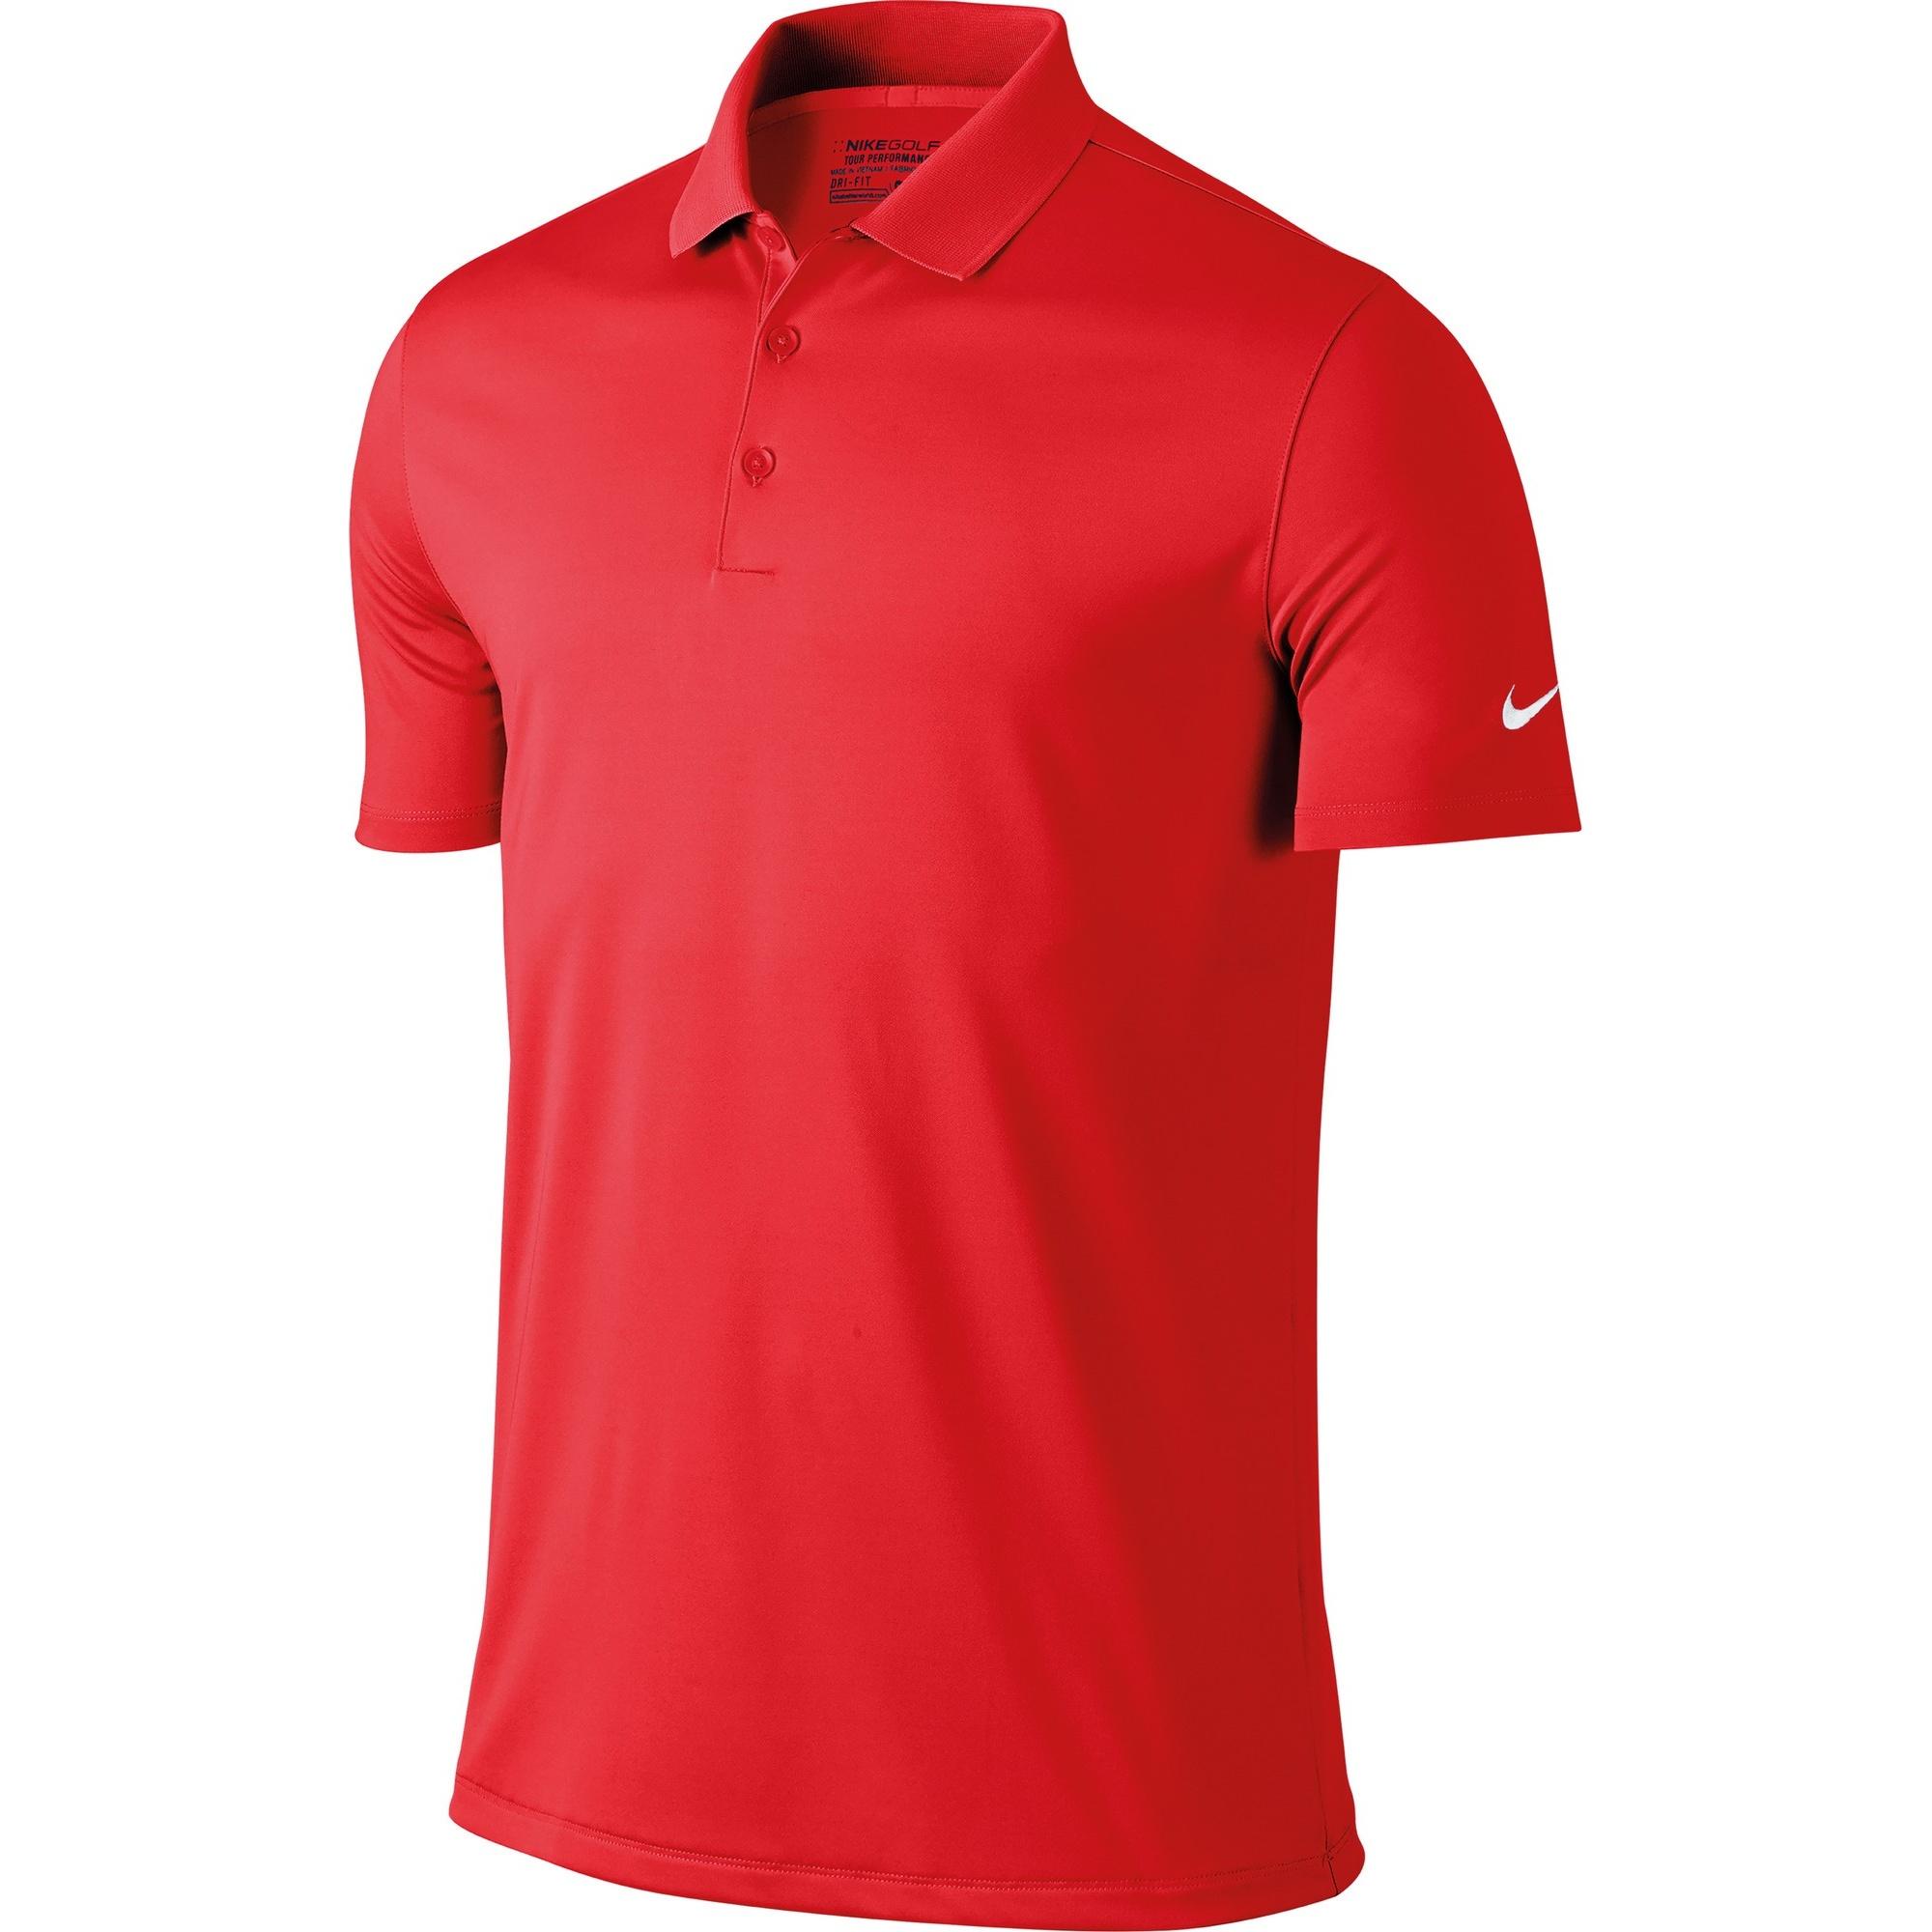 Nike Mens Victory Short Sleeve Solid Polo Shirt (S) (Team Orange)